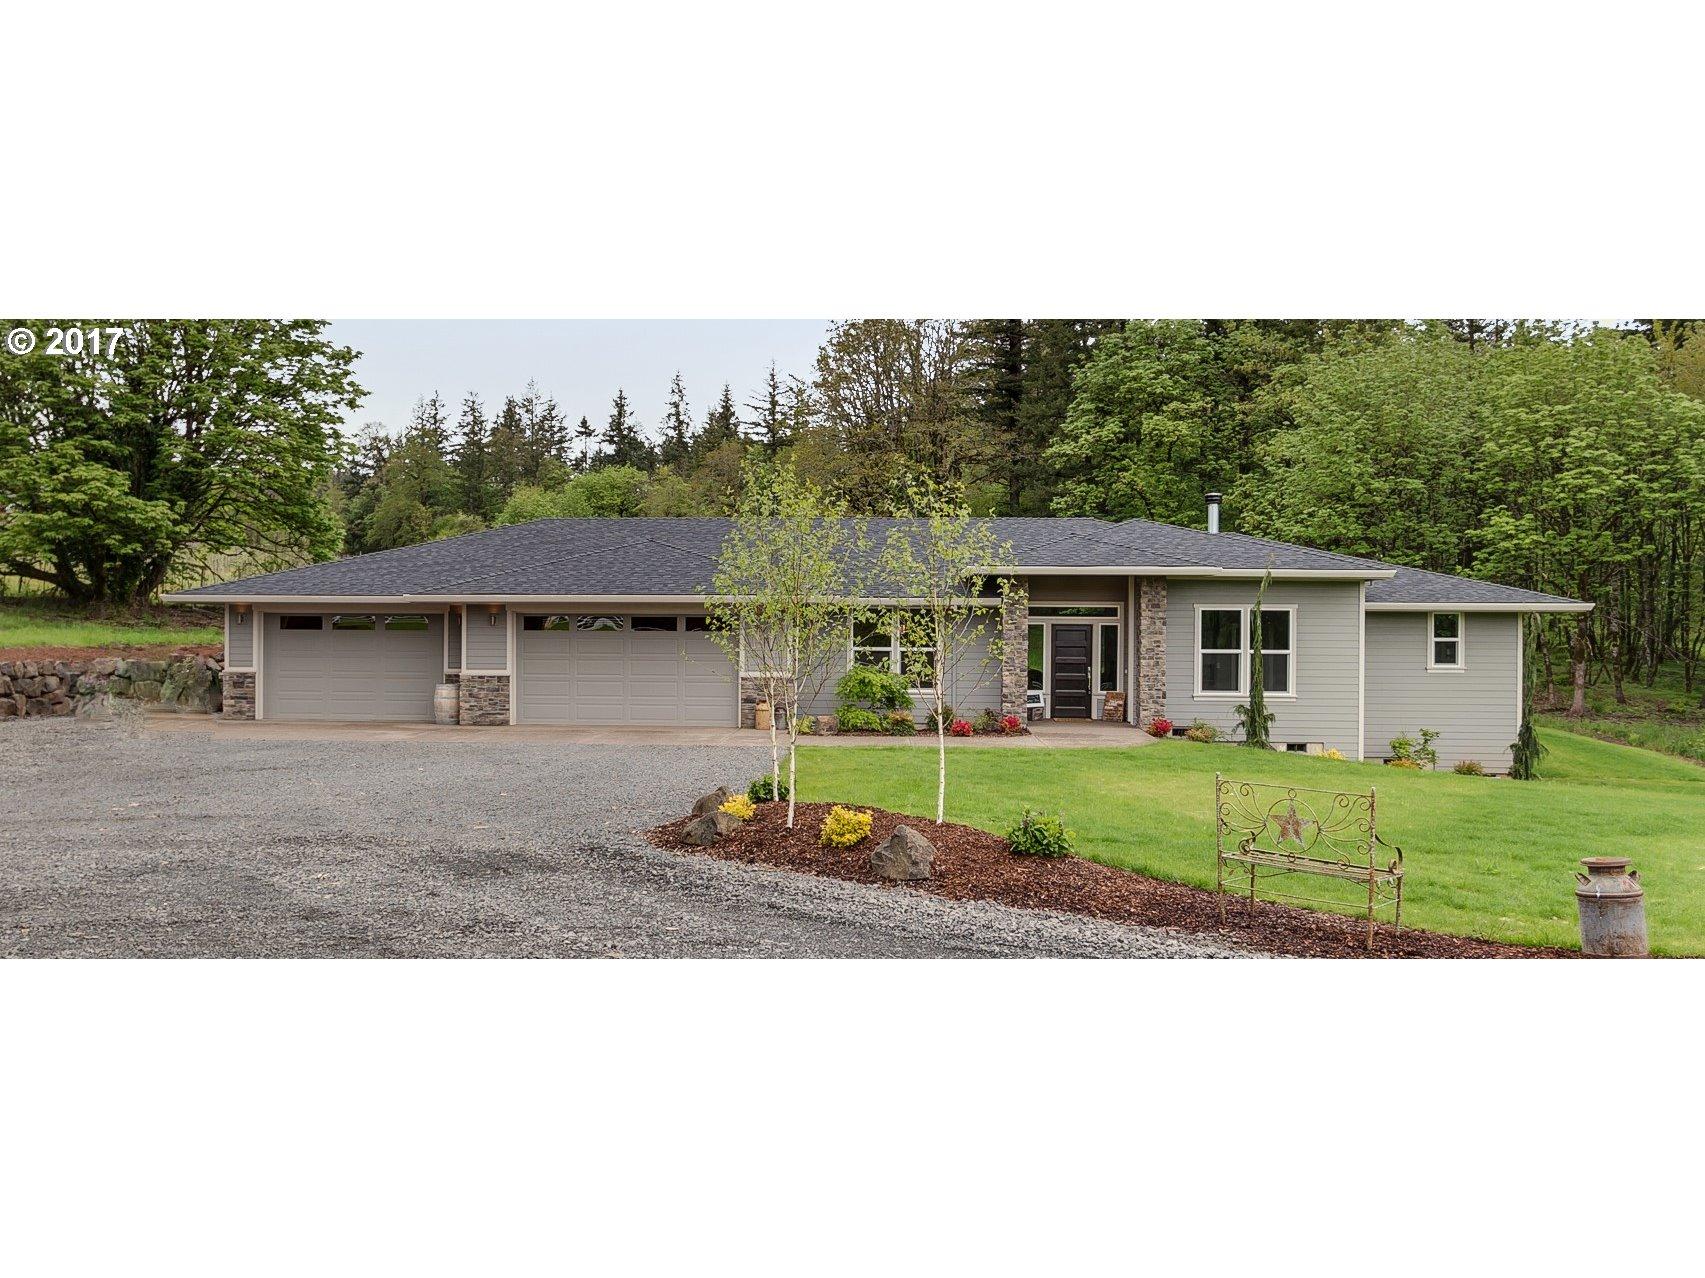 6750 NE EARLWOOD RD, Newberg, OR 97132